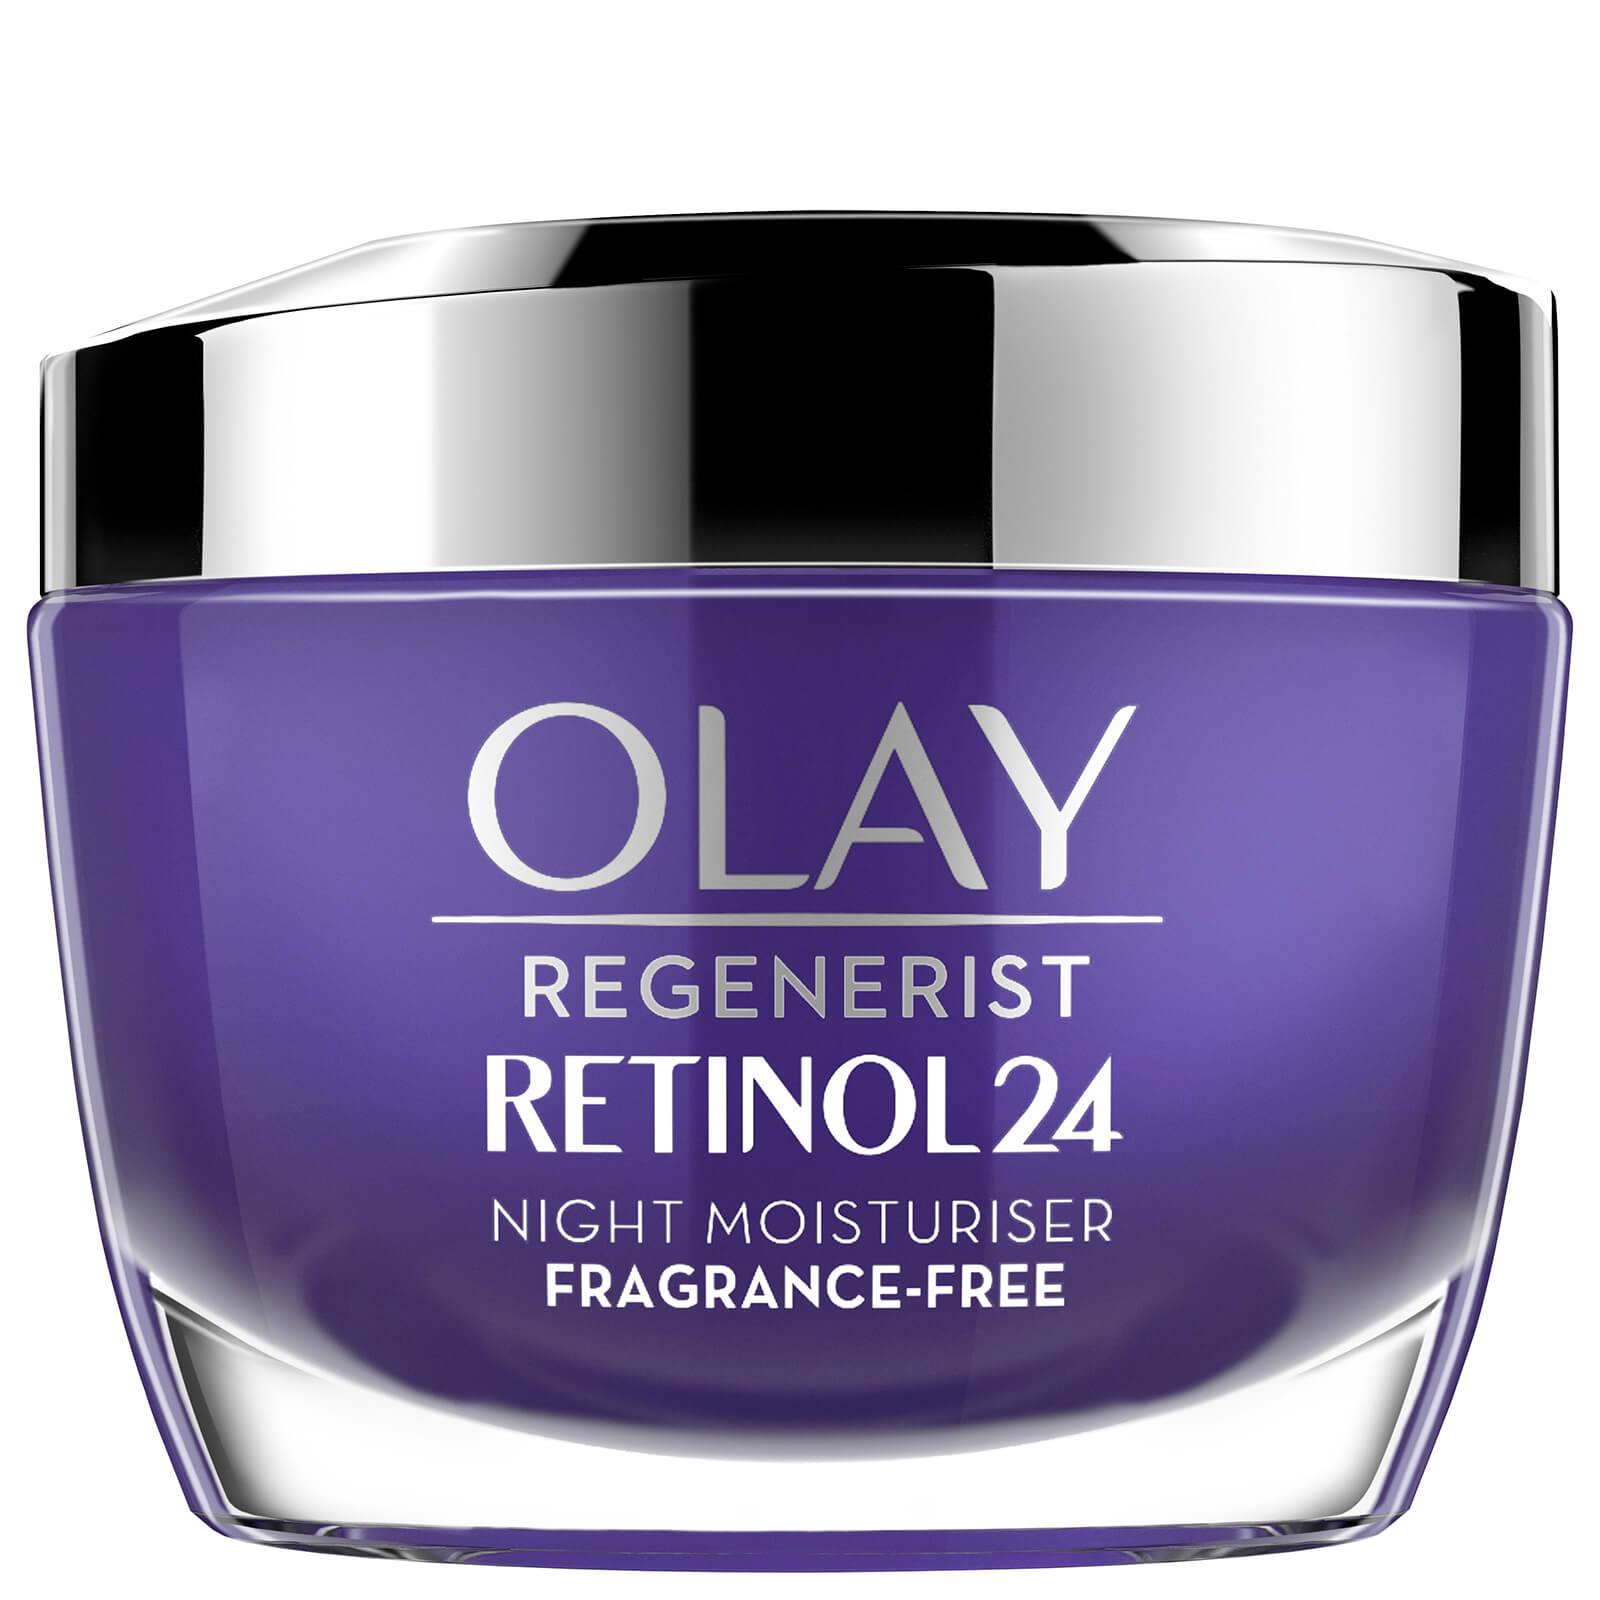 Купить Olay Retinol 24 Fragrance Free Night Face Cream for Smooth and Glowing Skin 50ml